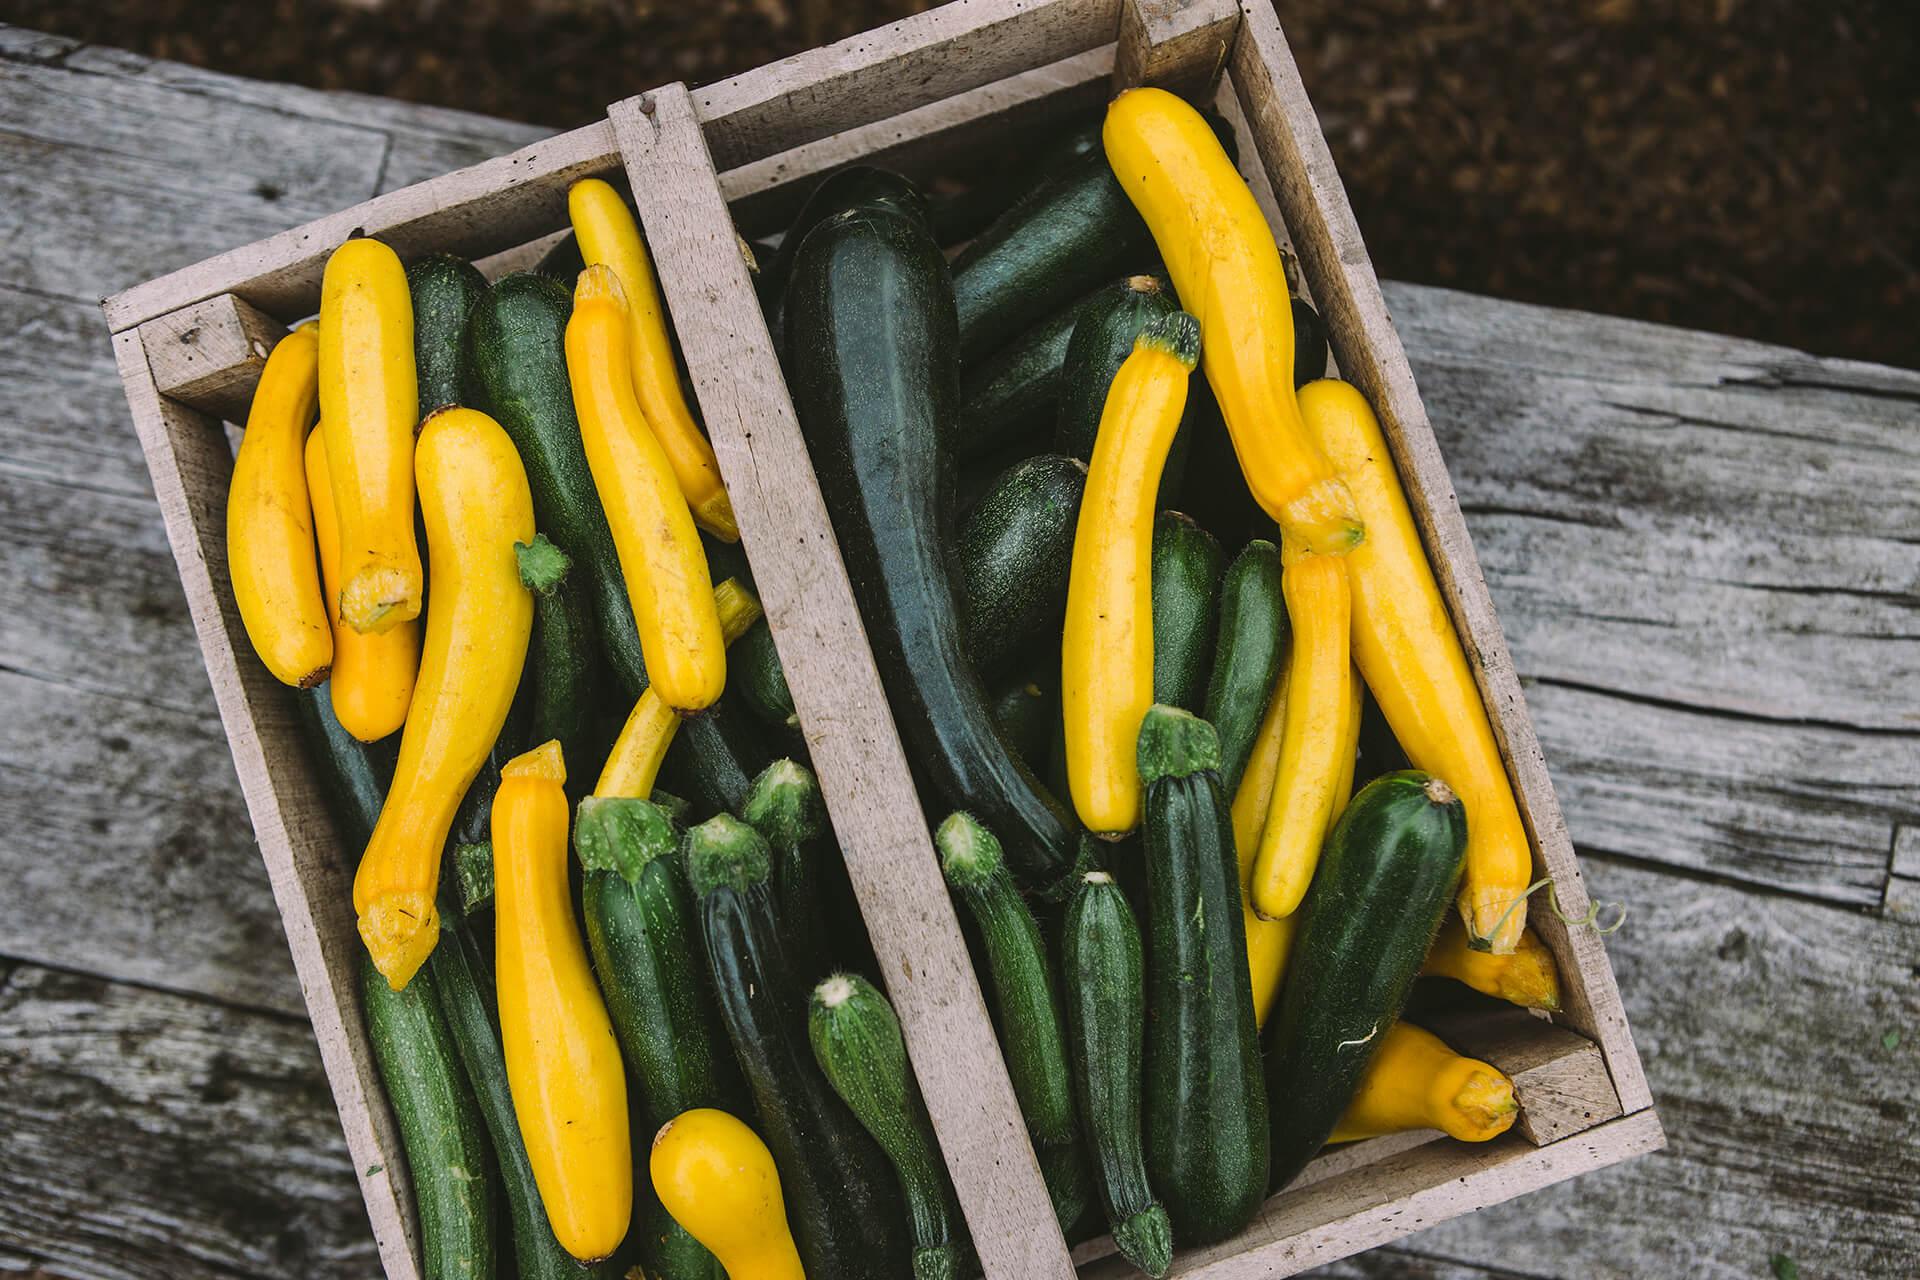 Daylesford, Daylesford Organic, Organic, Farm, Field, Green, Grass, Landscape, Vegetables, Summer, Photography, Agency, Marketing, Gloucestershire, WeAreShuffle